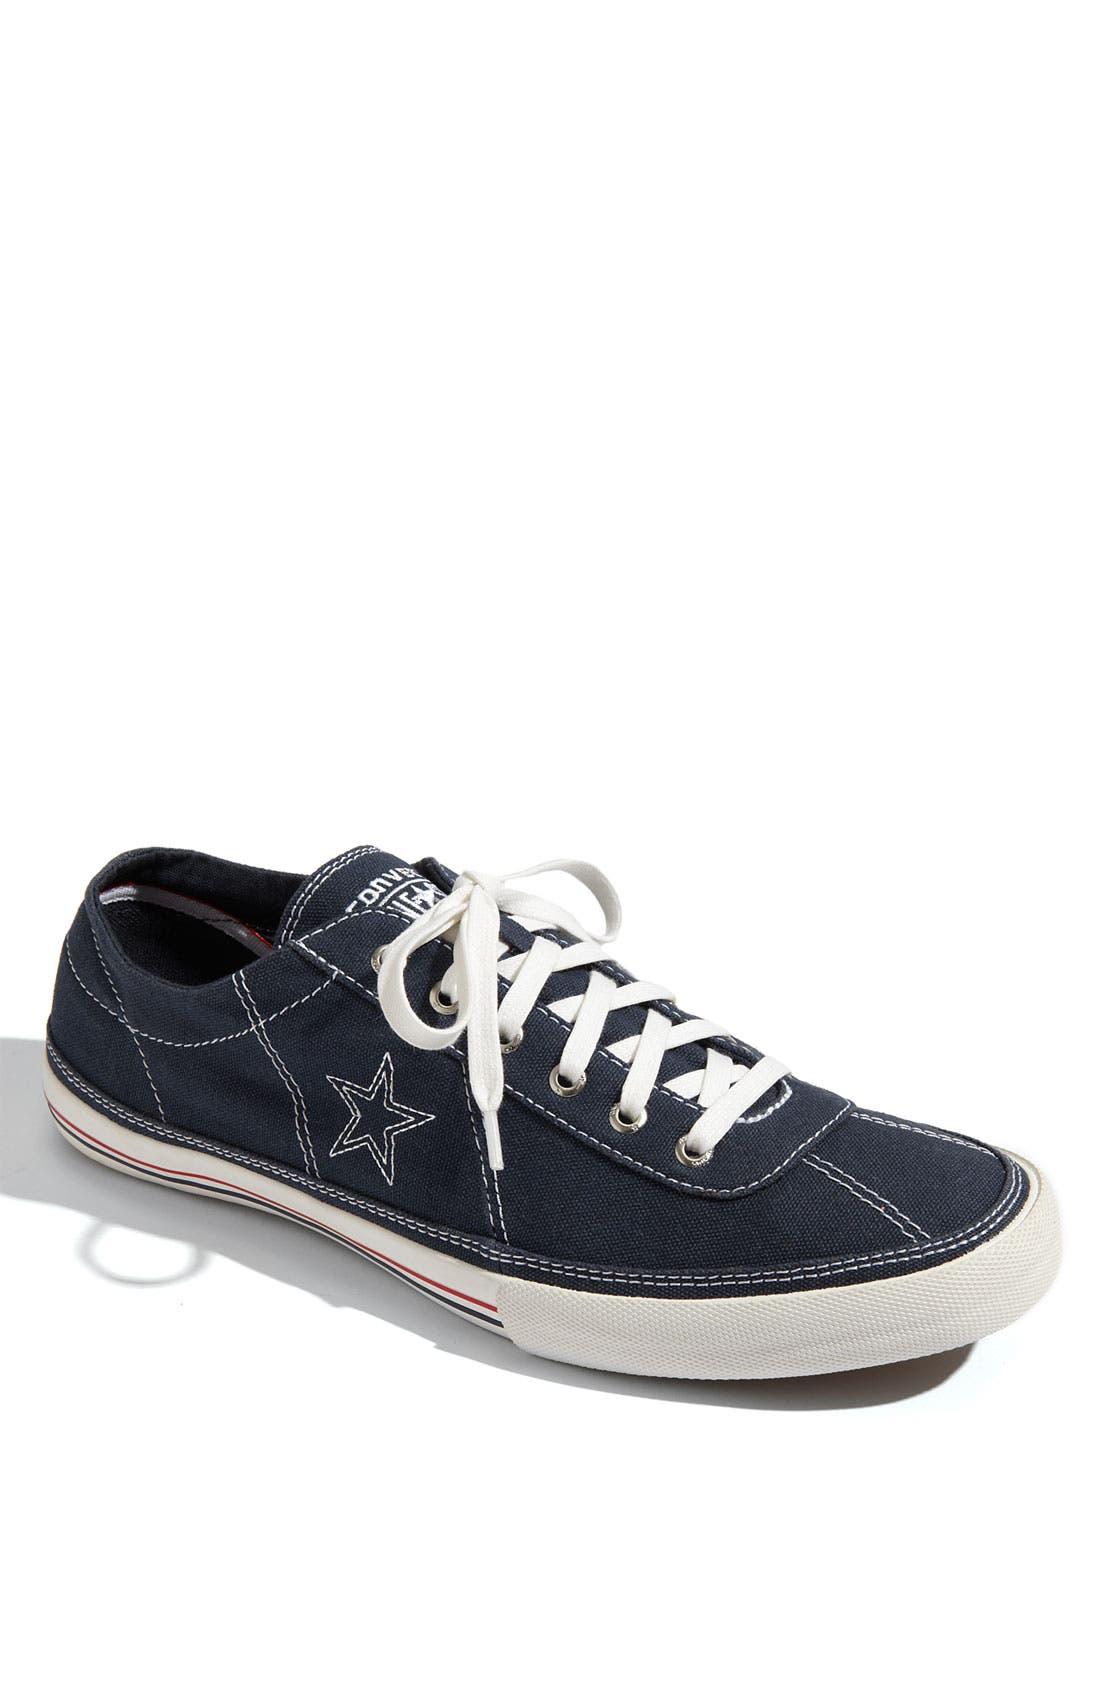 Main Image - Converse 'One Star Baseline' Sneaker